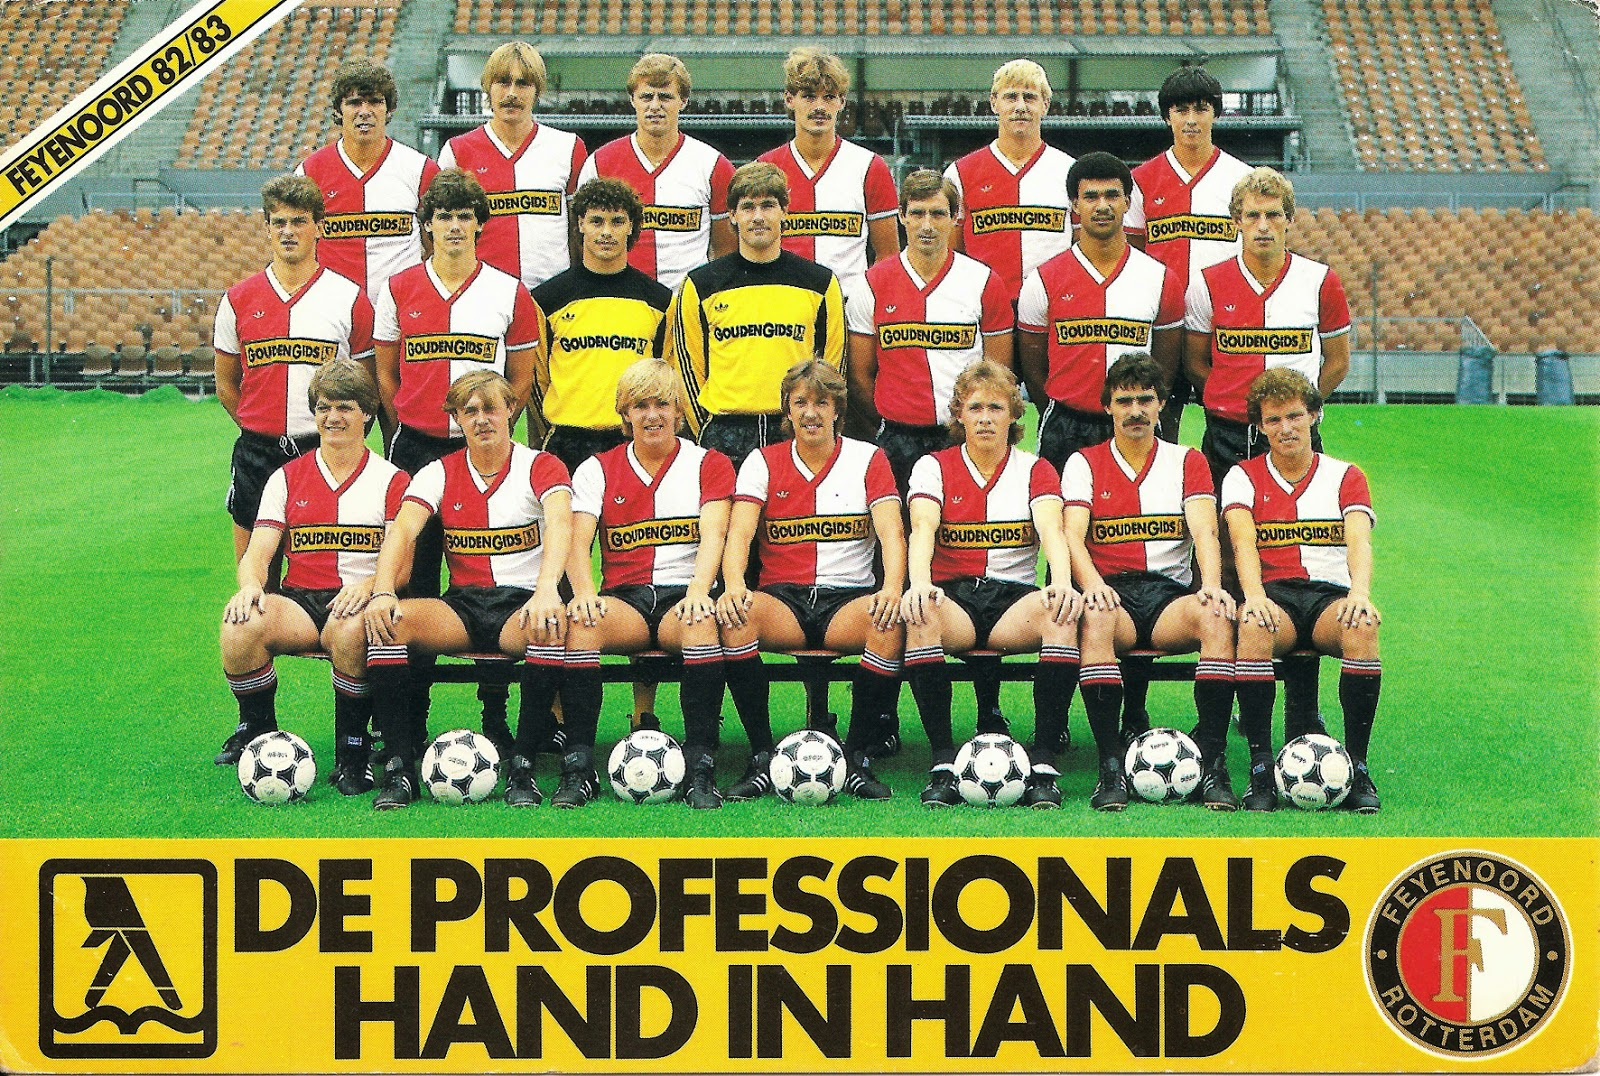 FEYENOORD ROTTERDAM 1982-83. ~ THE VINTAGE FOOTBALL CLUB